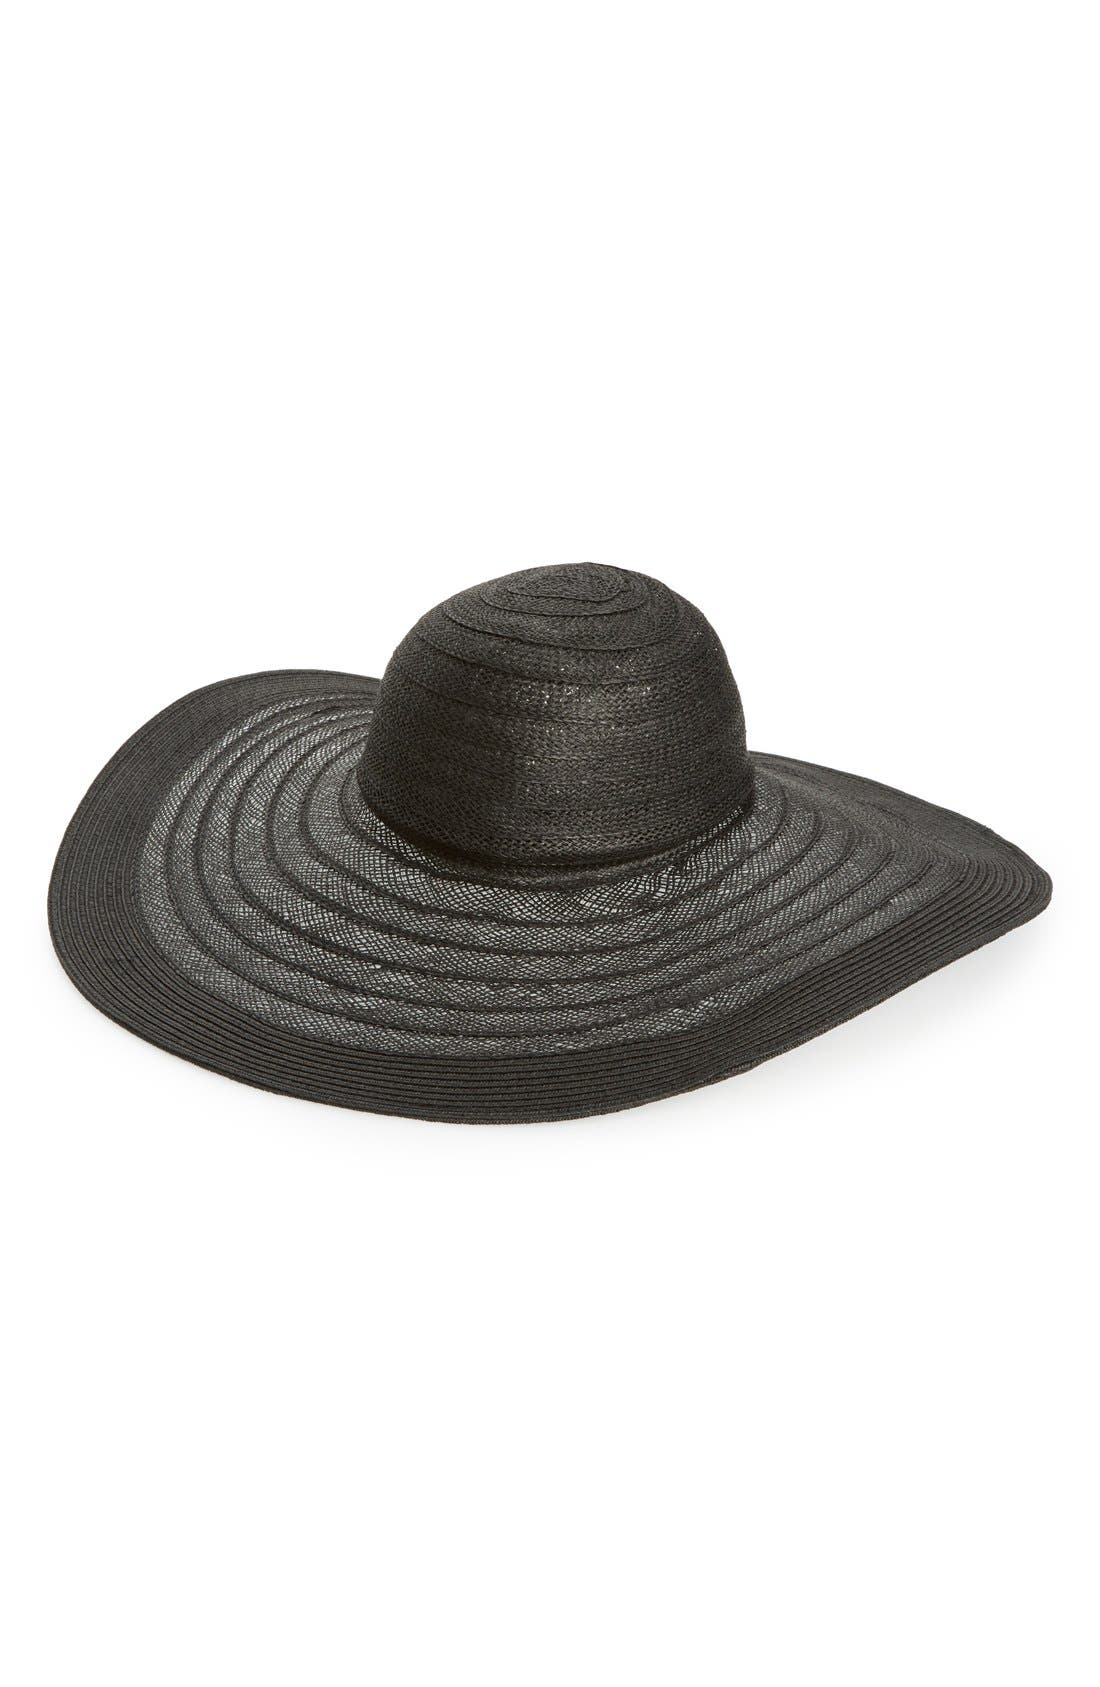 Alternate Image 1 Selected - Nordstrom Floppy Straw Hat